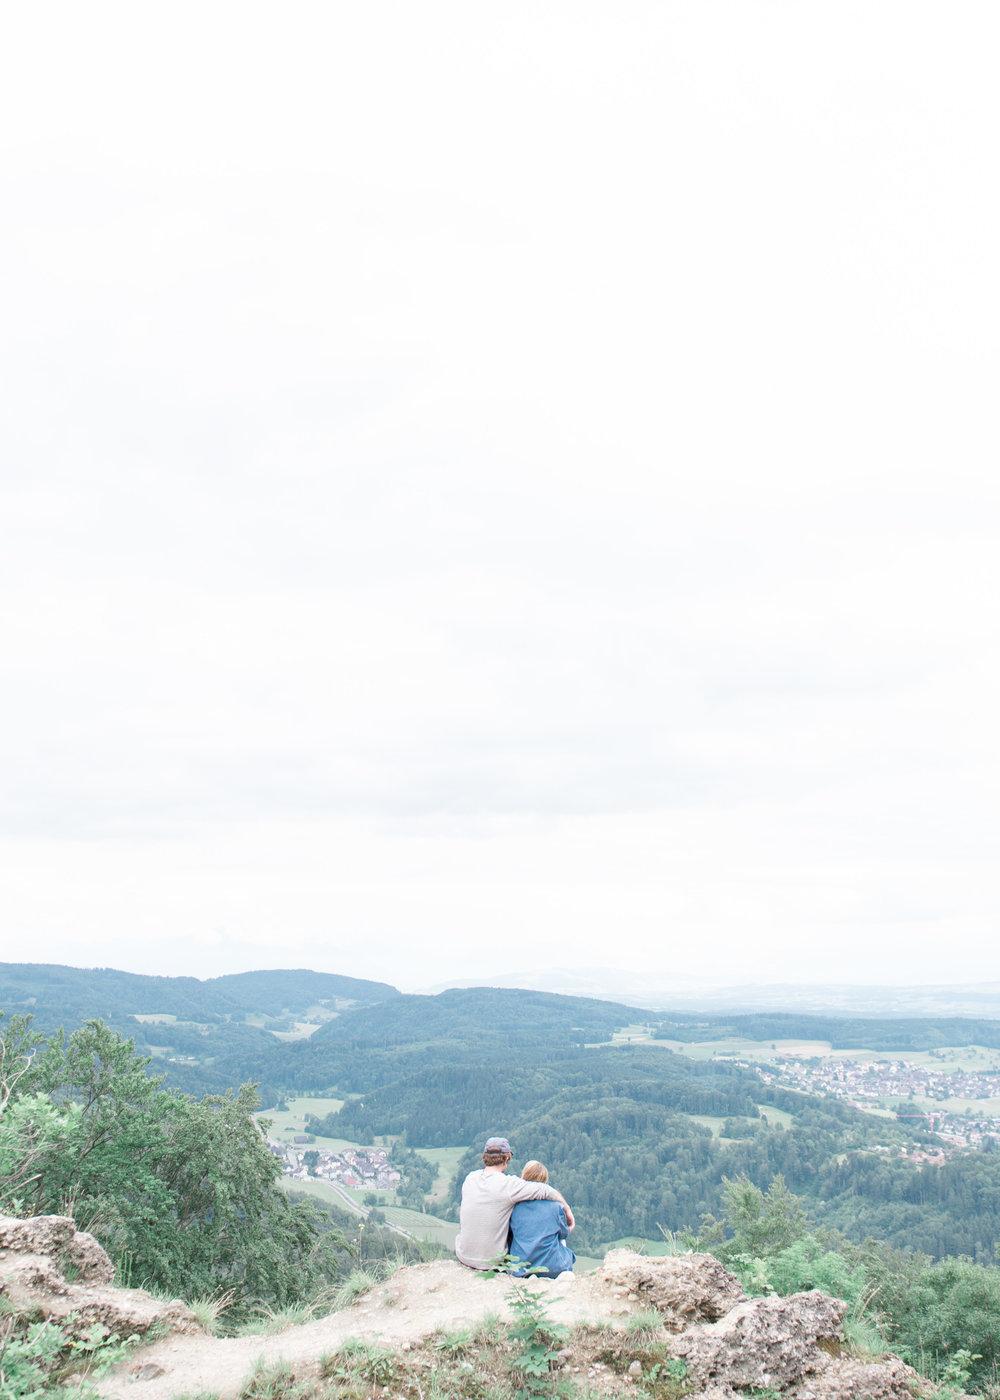 Uetliberg Zurich Carley Rudd Travel Photography